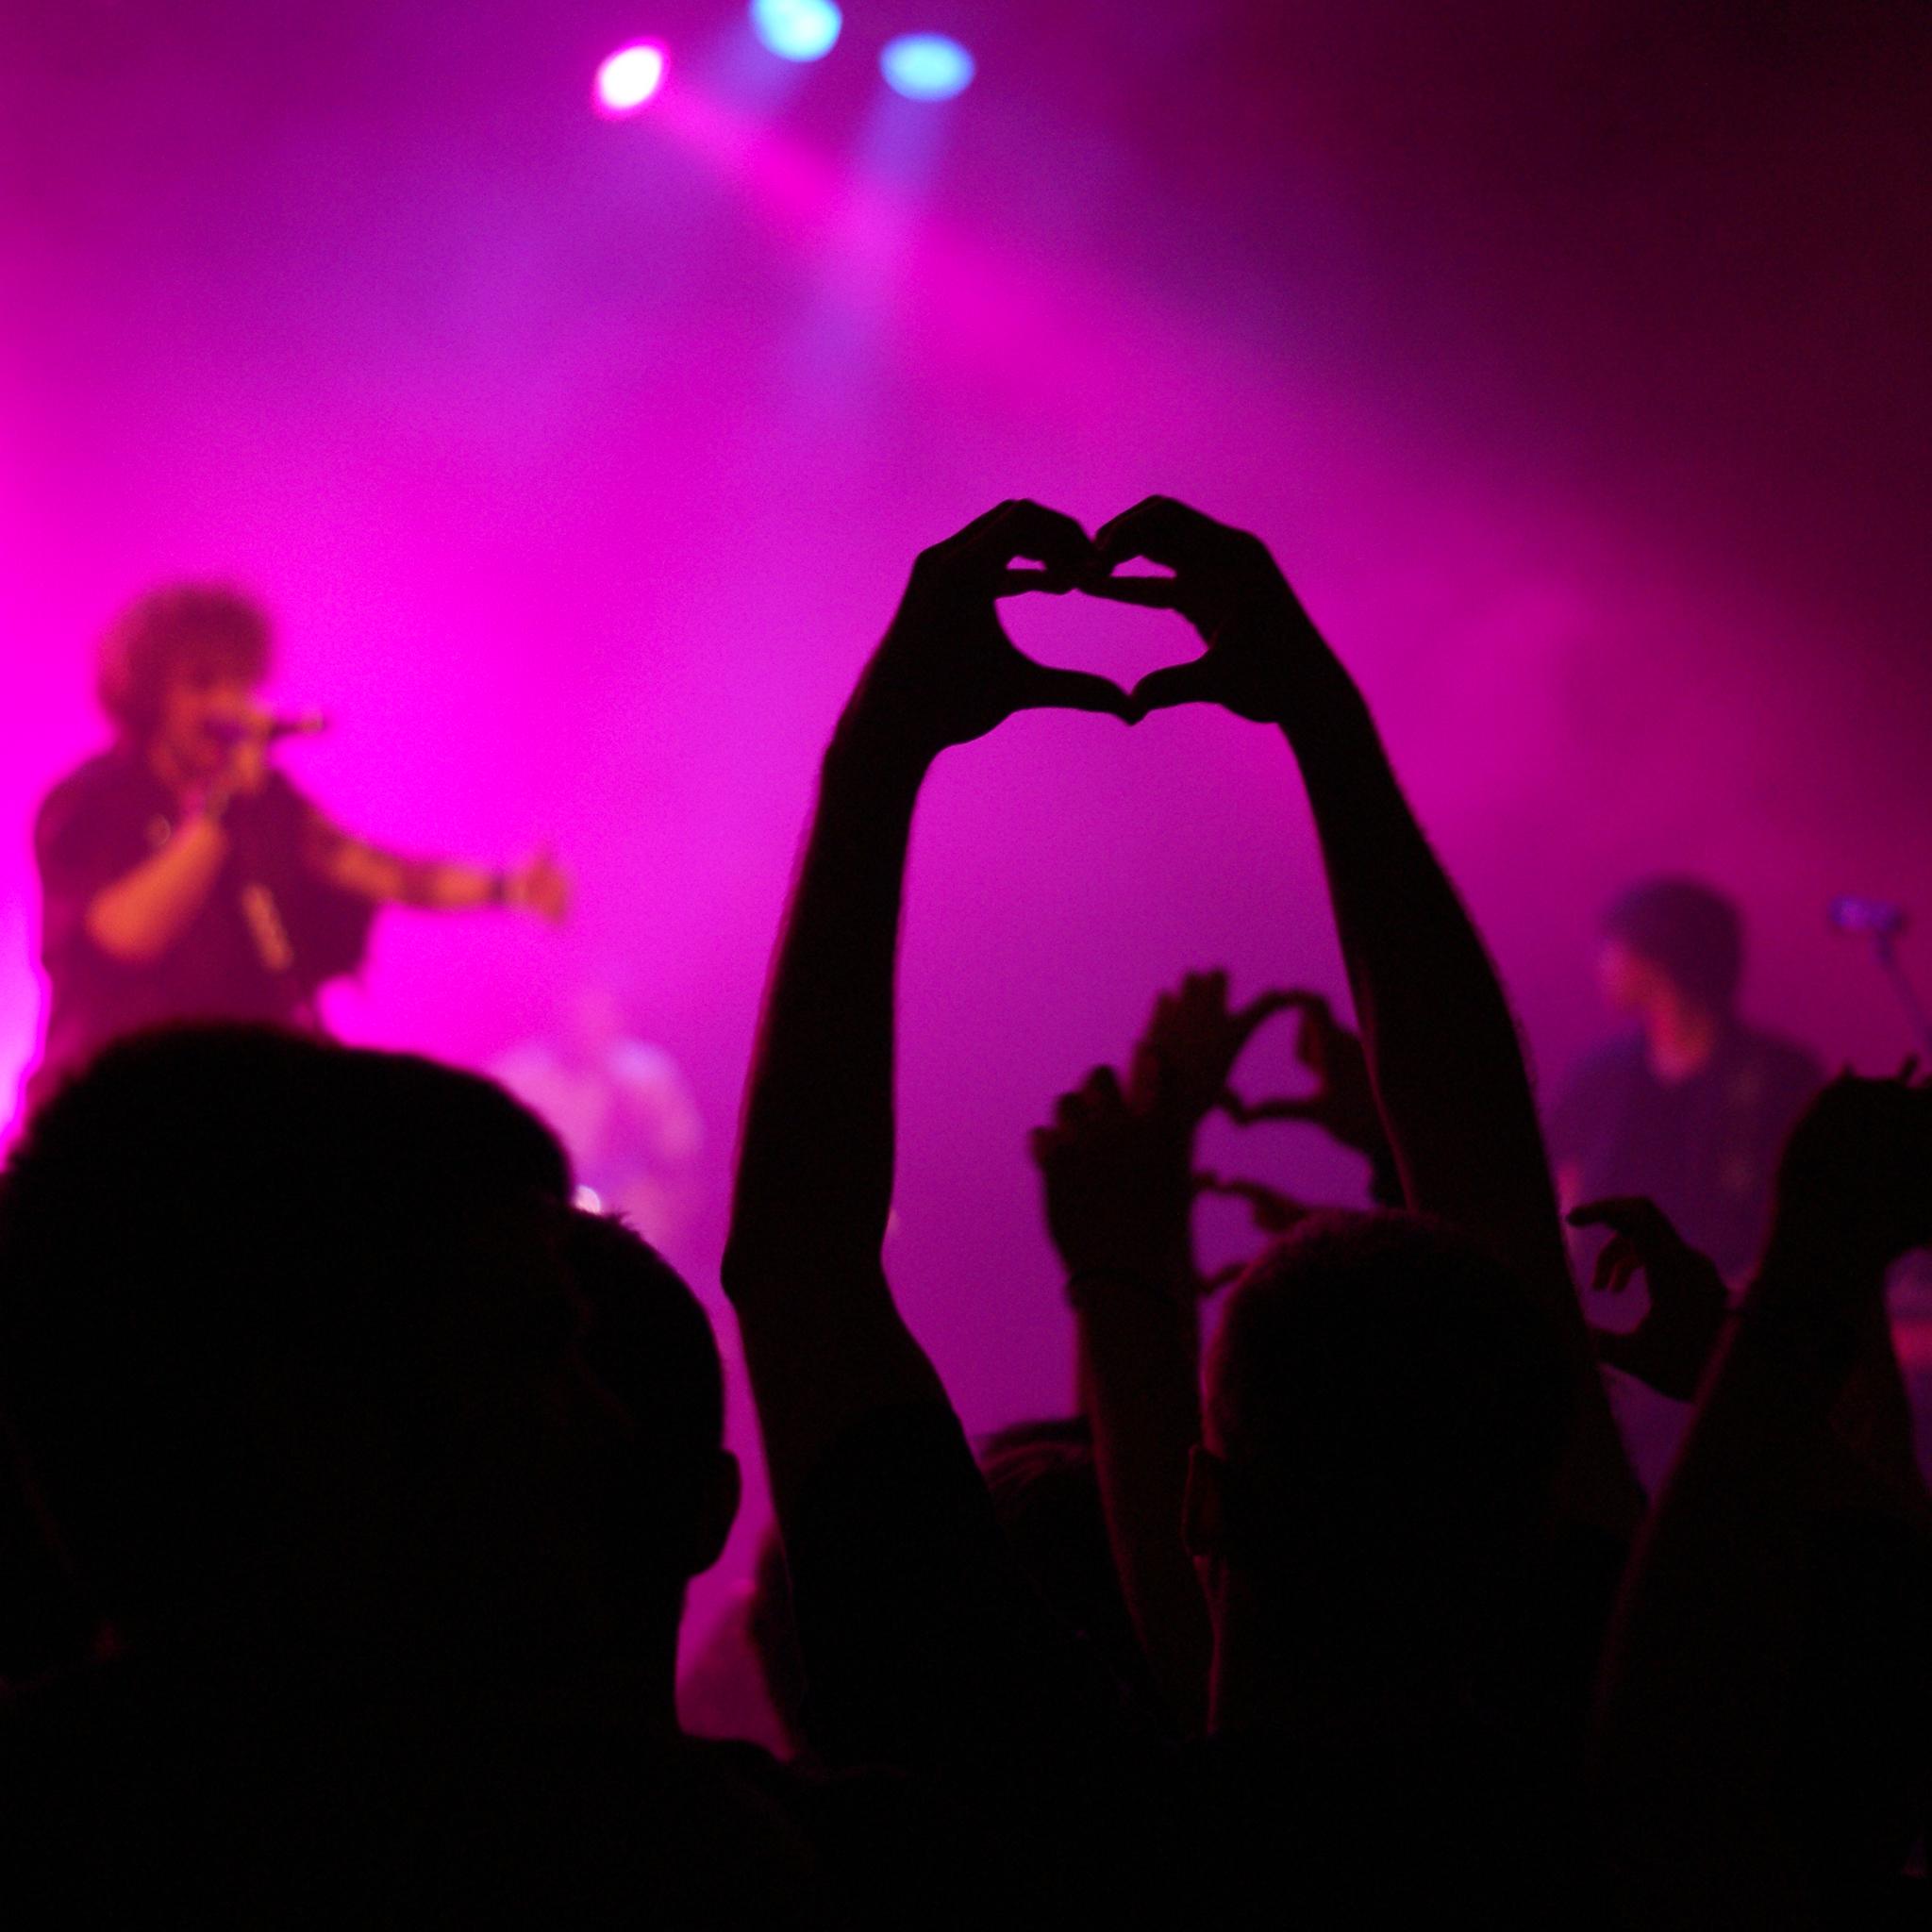 Love Concert 3Wallpapers ipad Retina Love Concert   iPad Retina